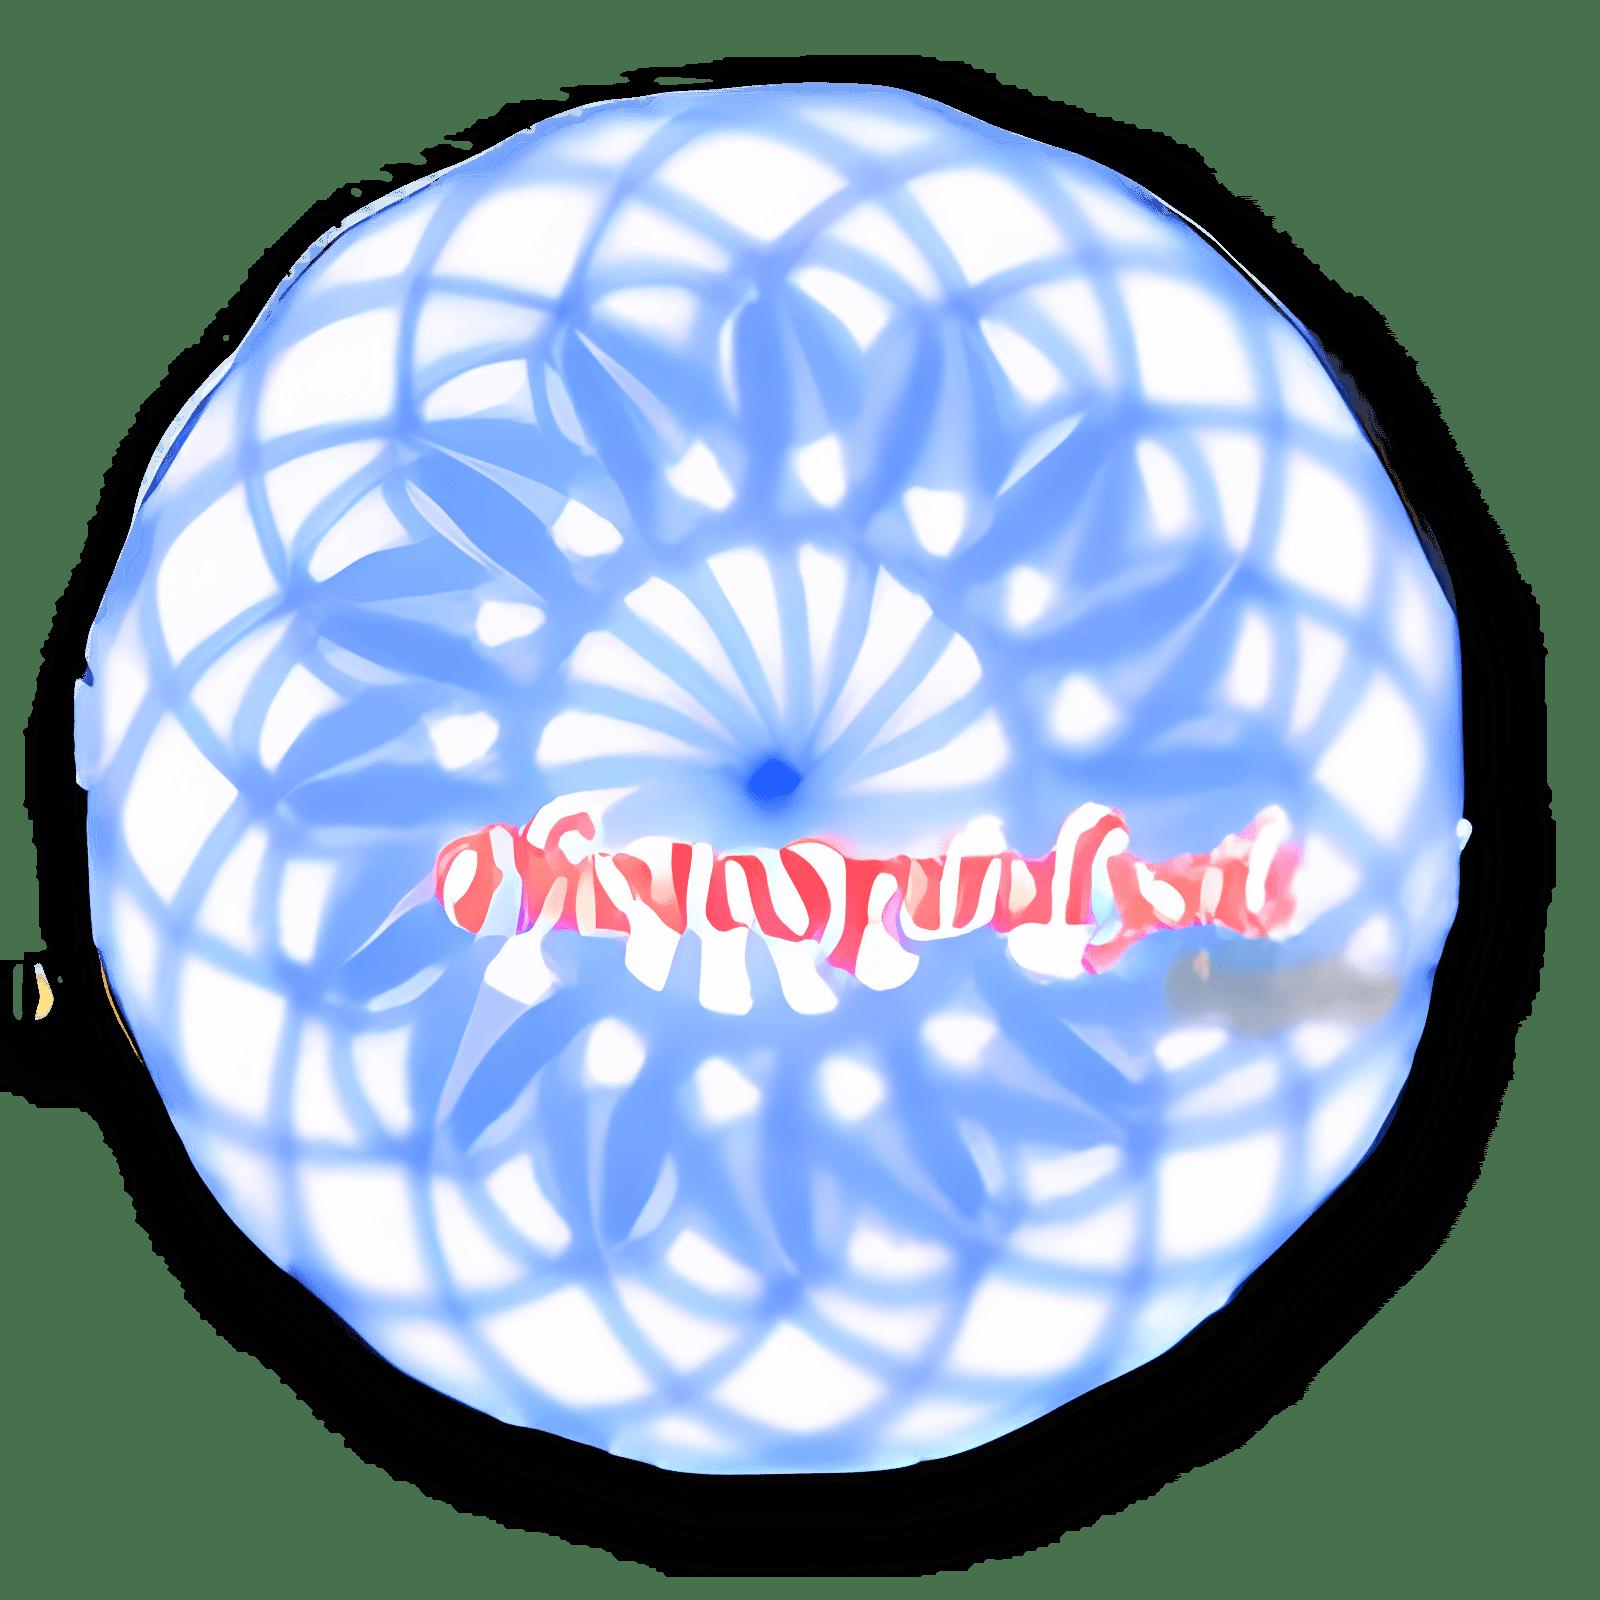 PhotoSpiralysis 1.1.0.2 Alpha